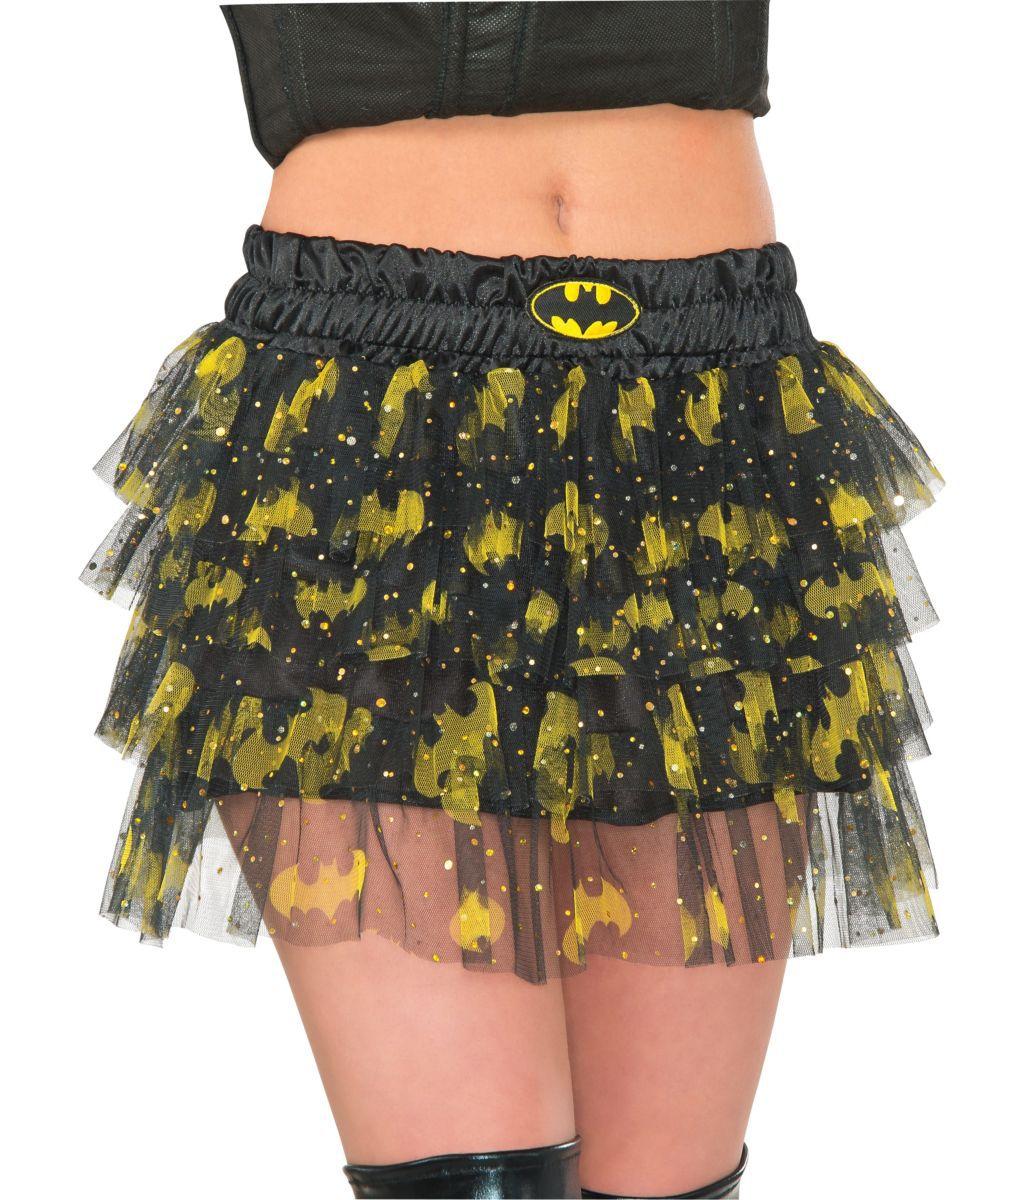 Saia Batgirl: Batman (Acessório Fantasia) - Rubies Costume - CD